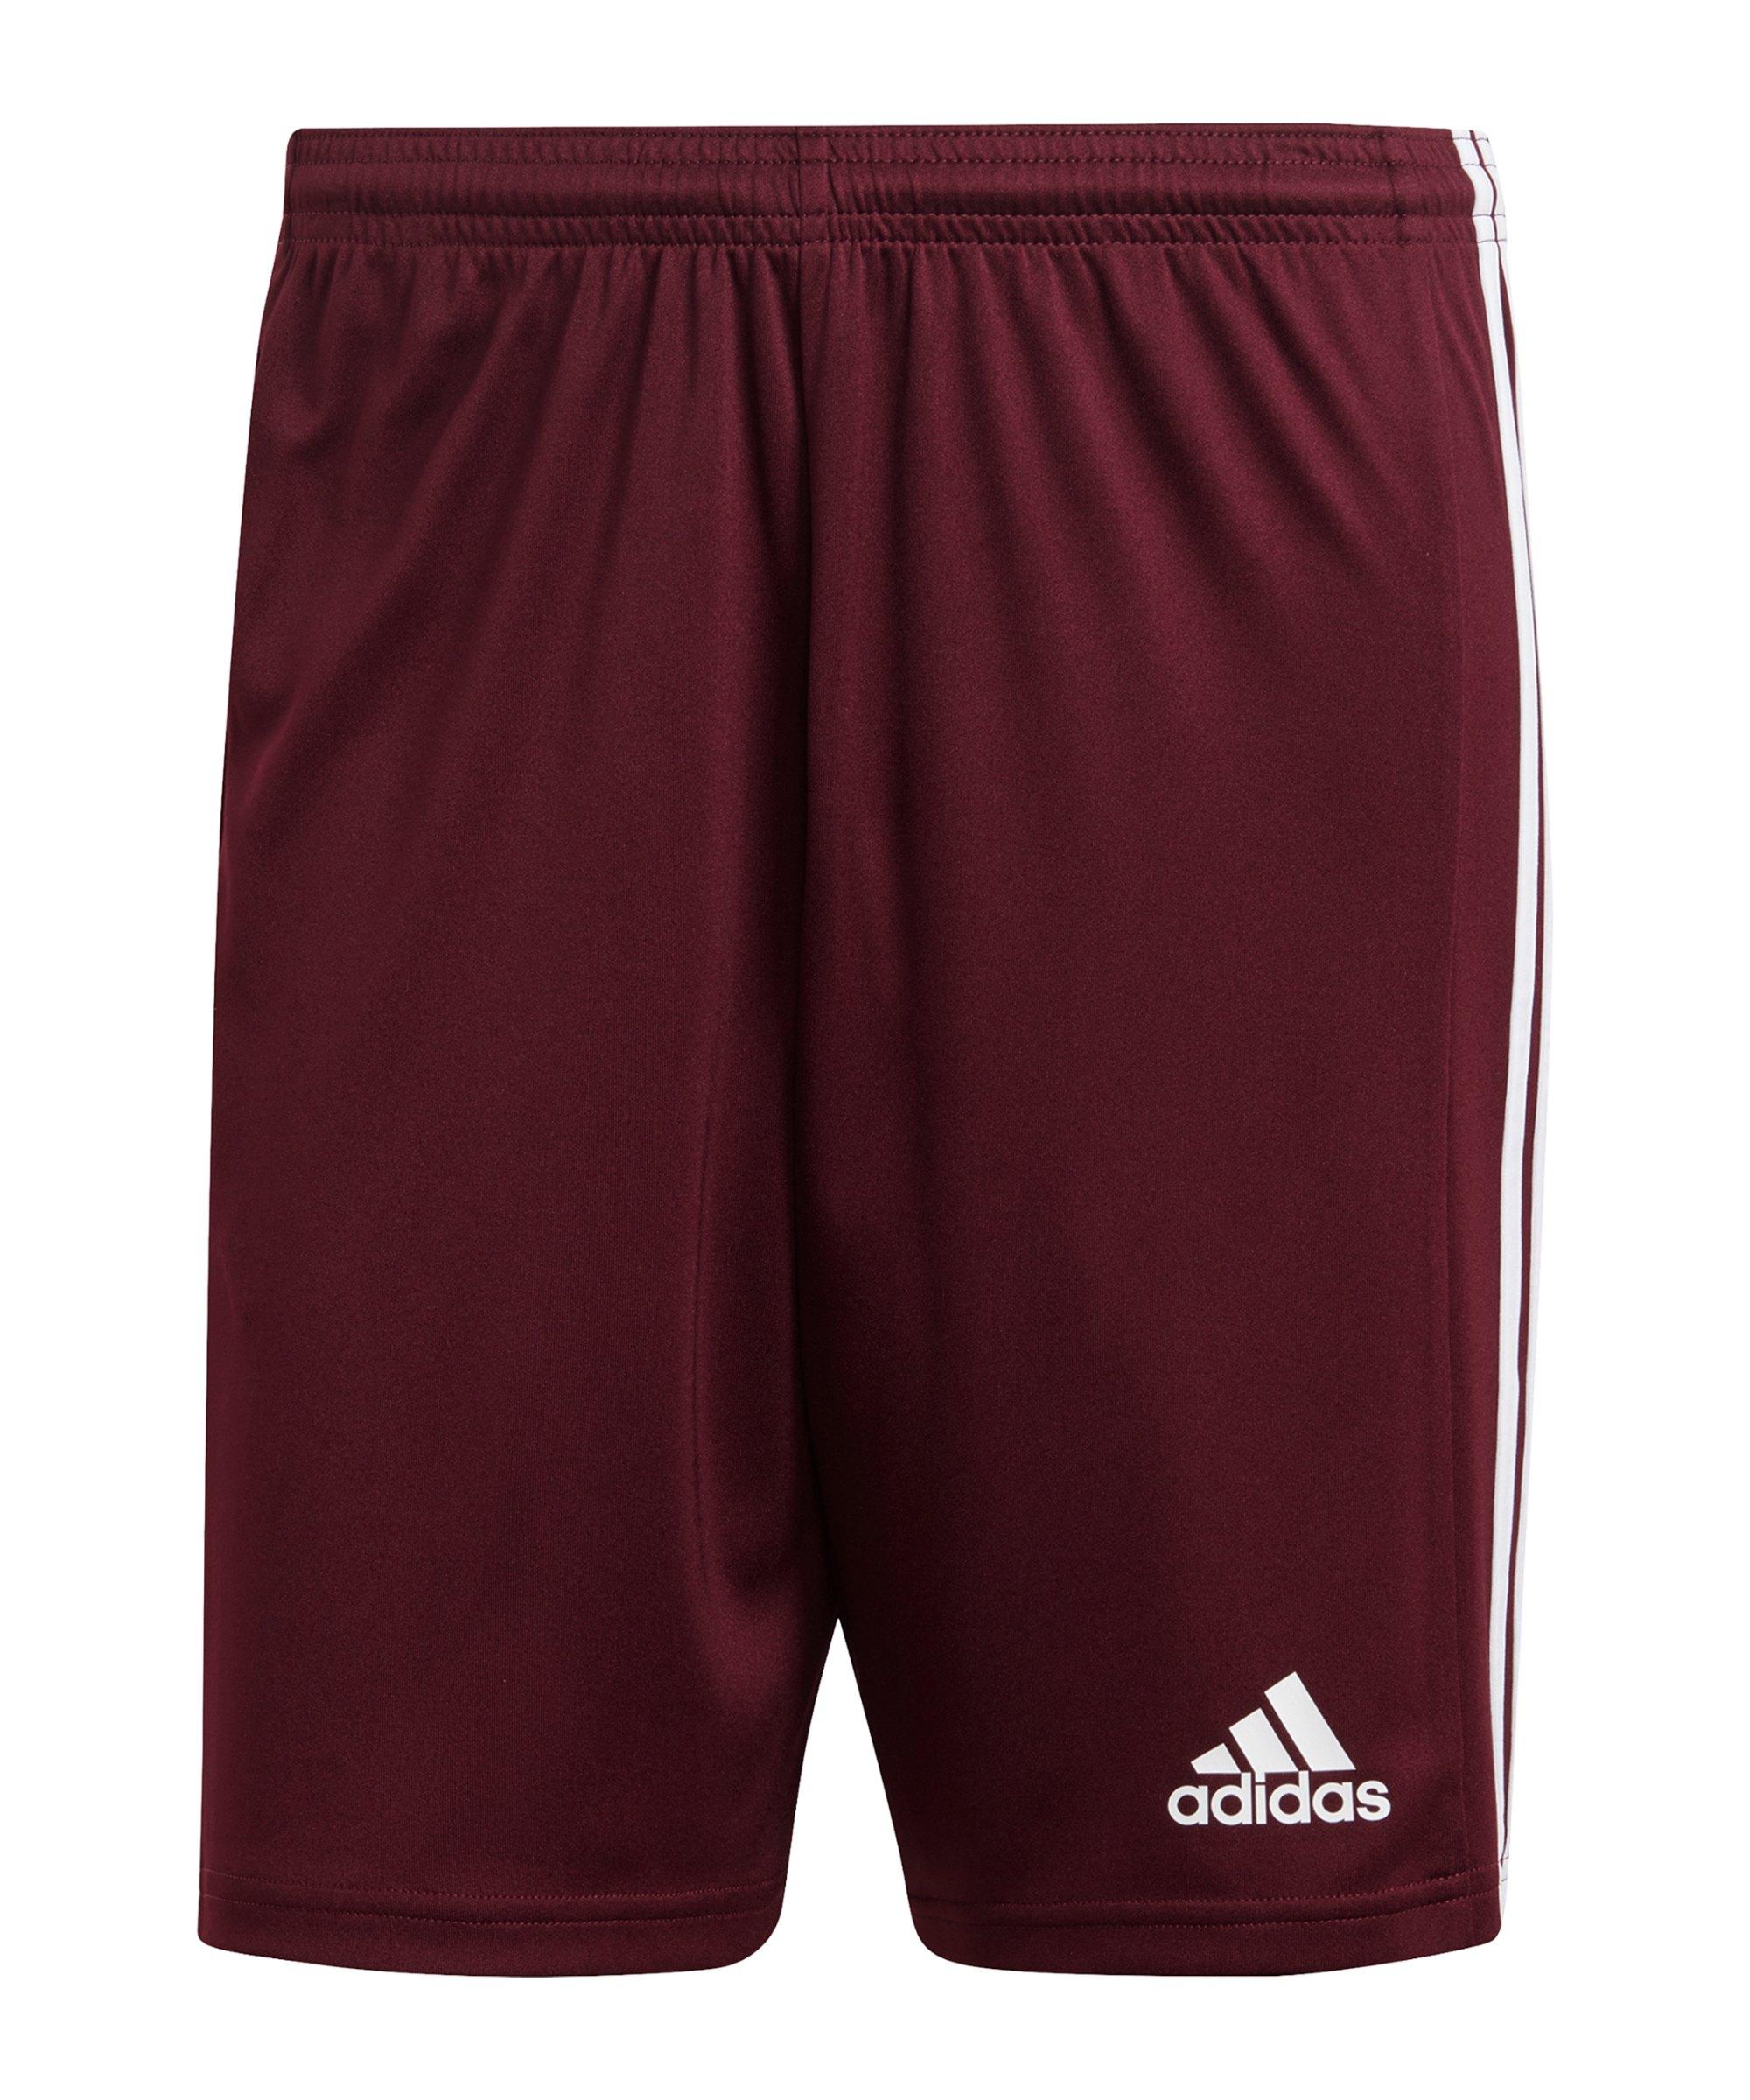 adidas Squadra 21 Short Dunkelrot Weiss - rot